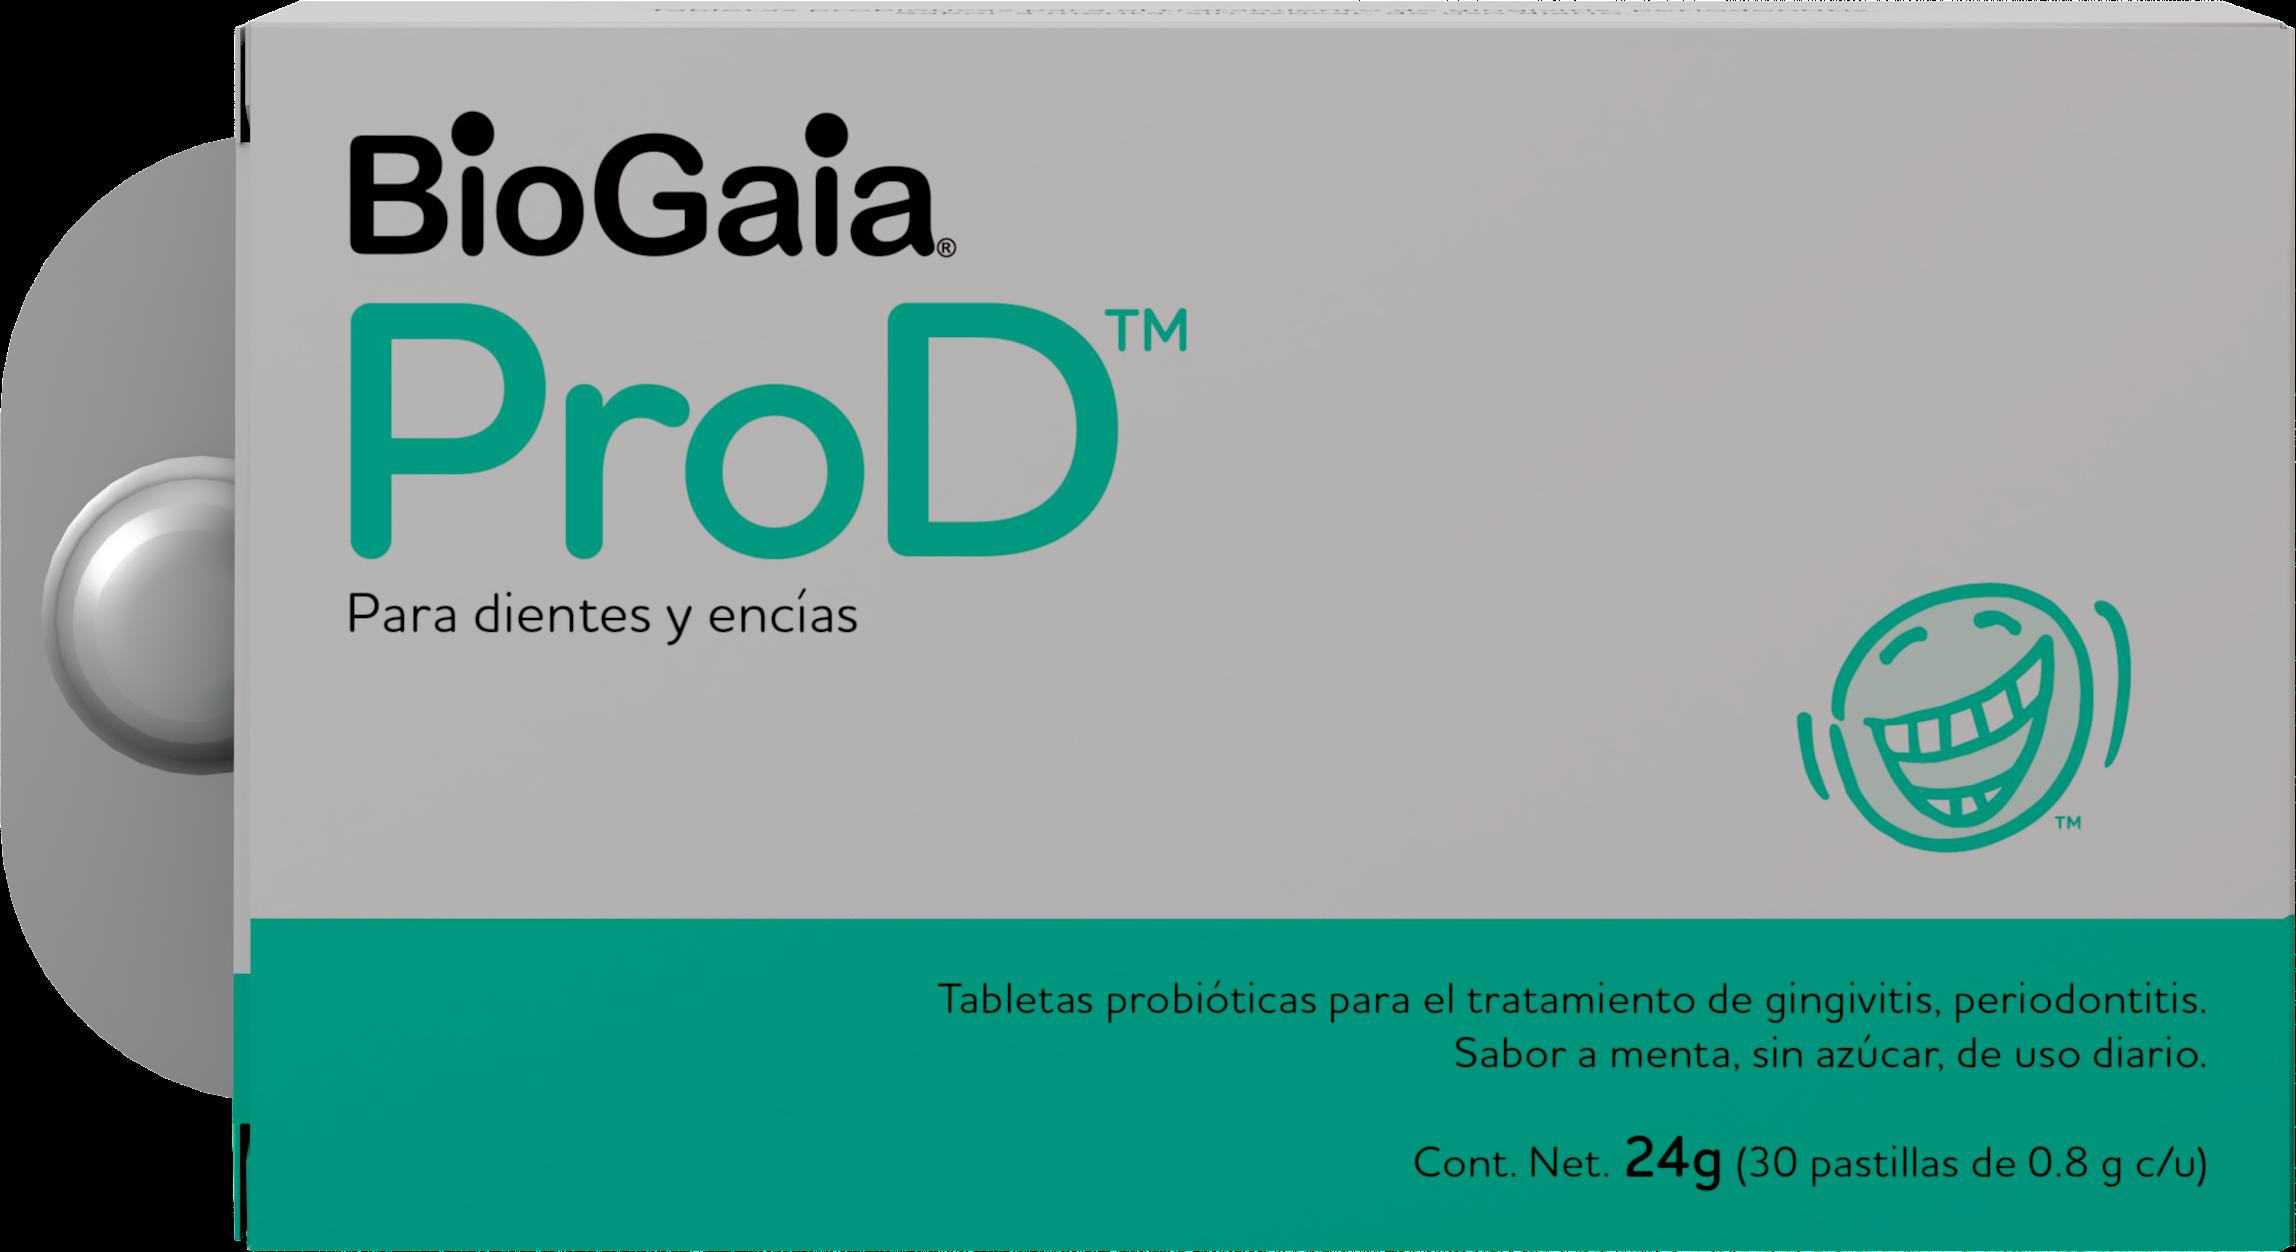 ProD Mexico